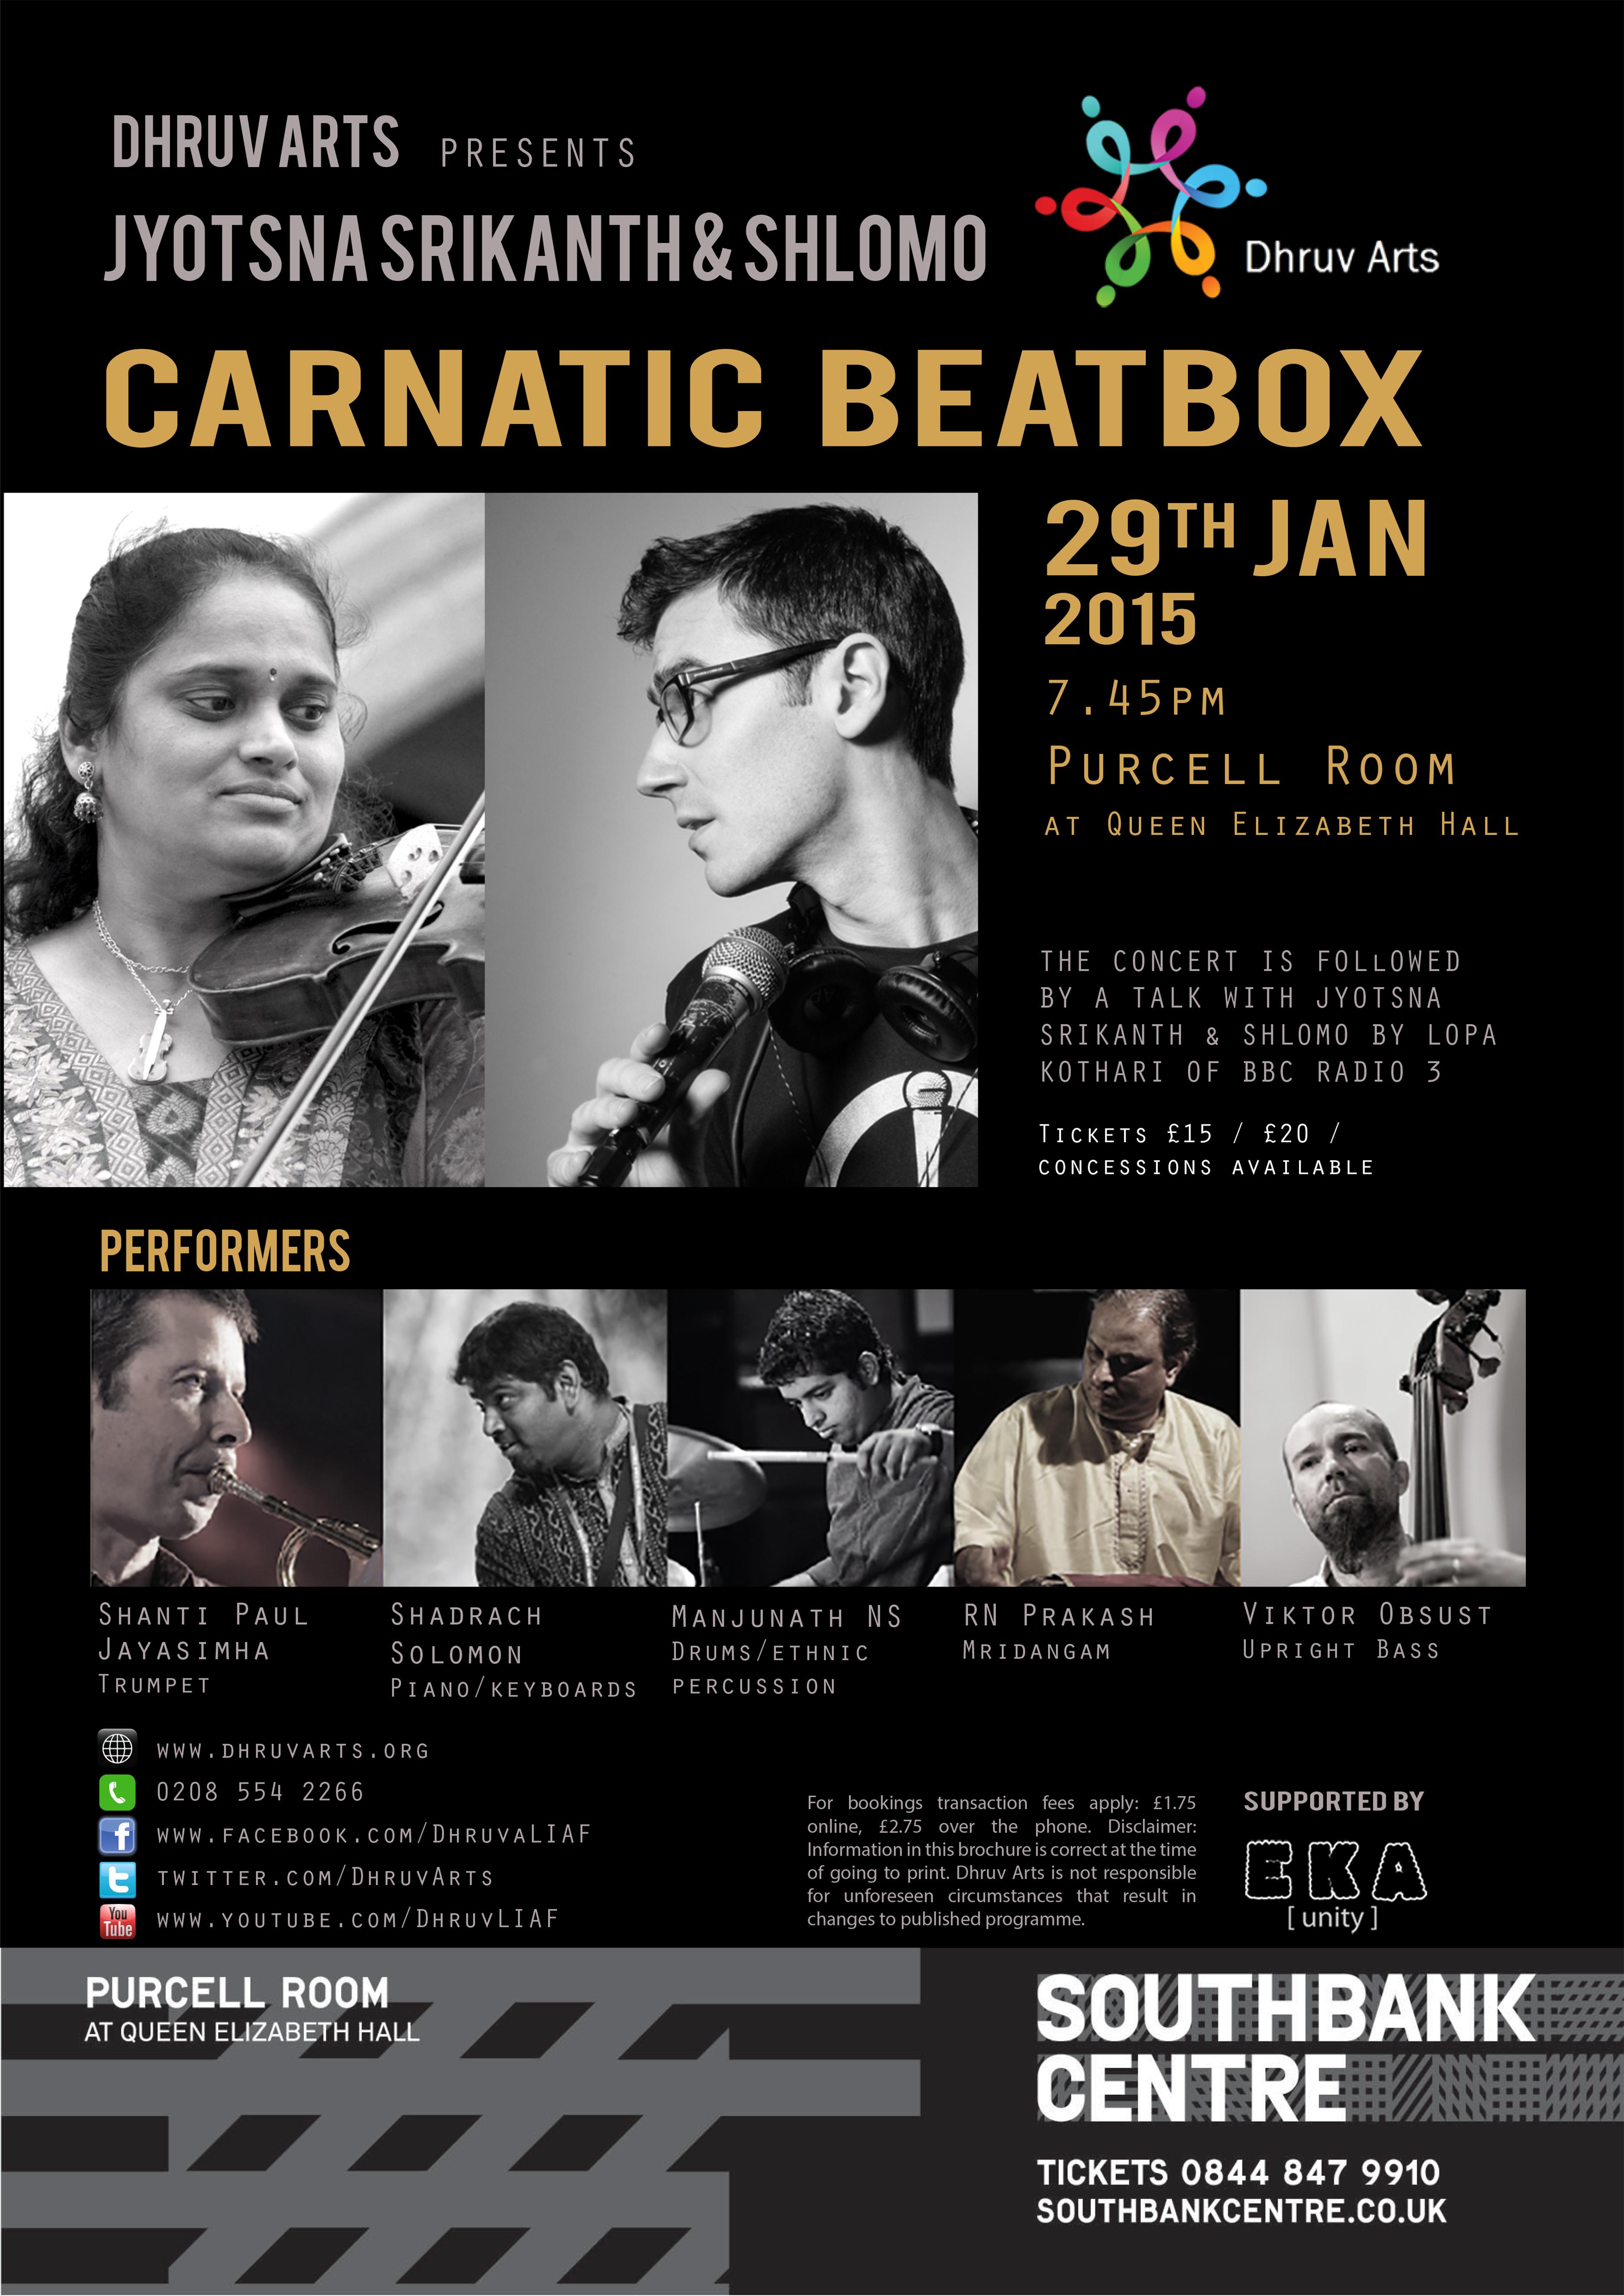 carnatic beatbox concert